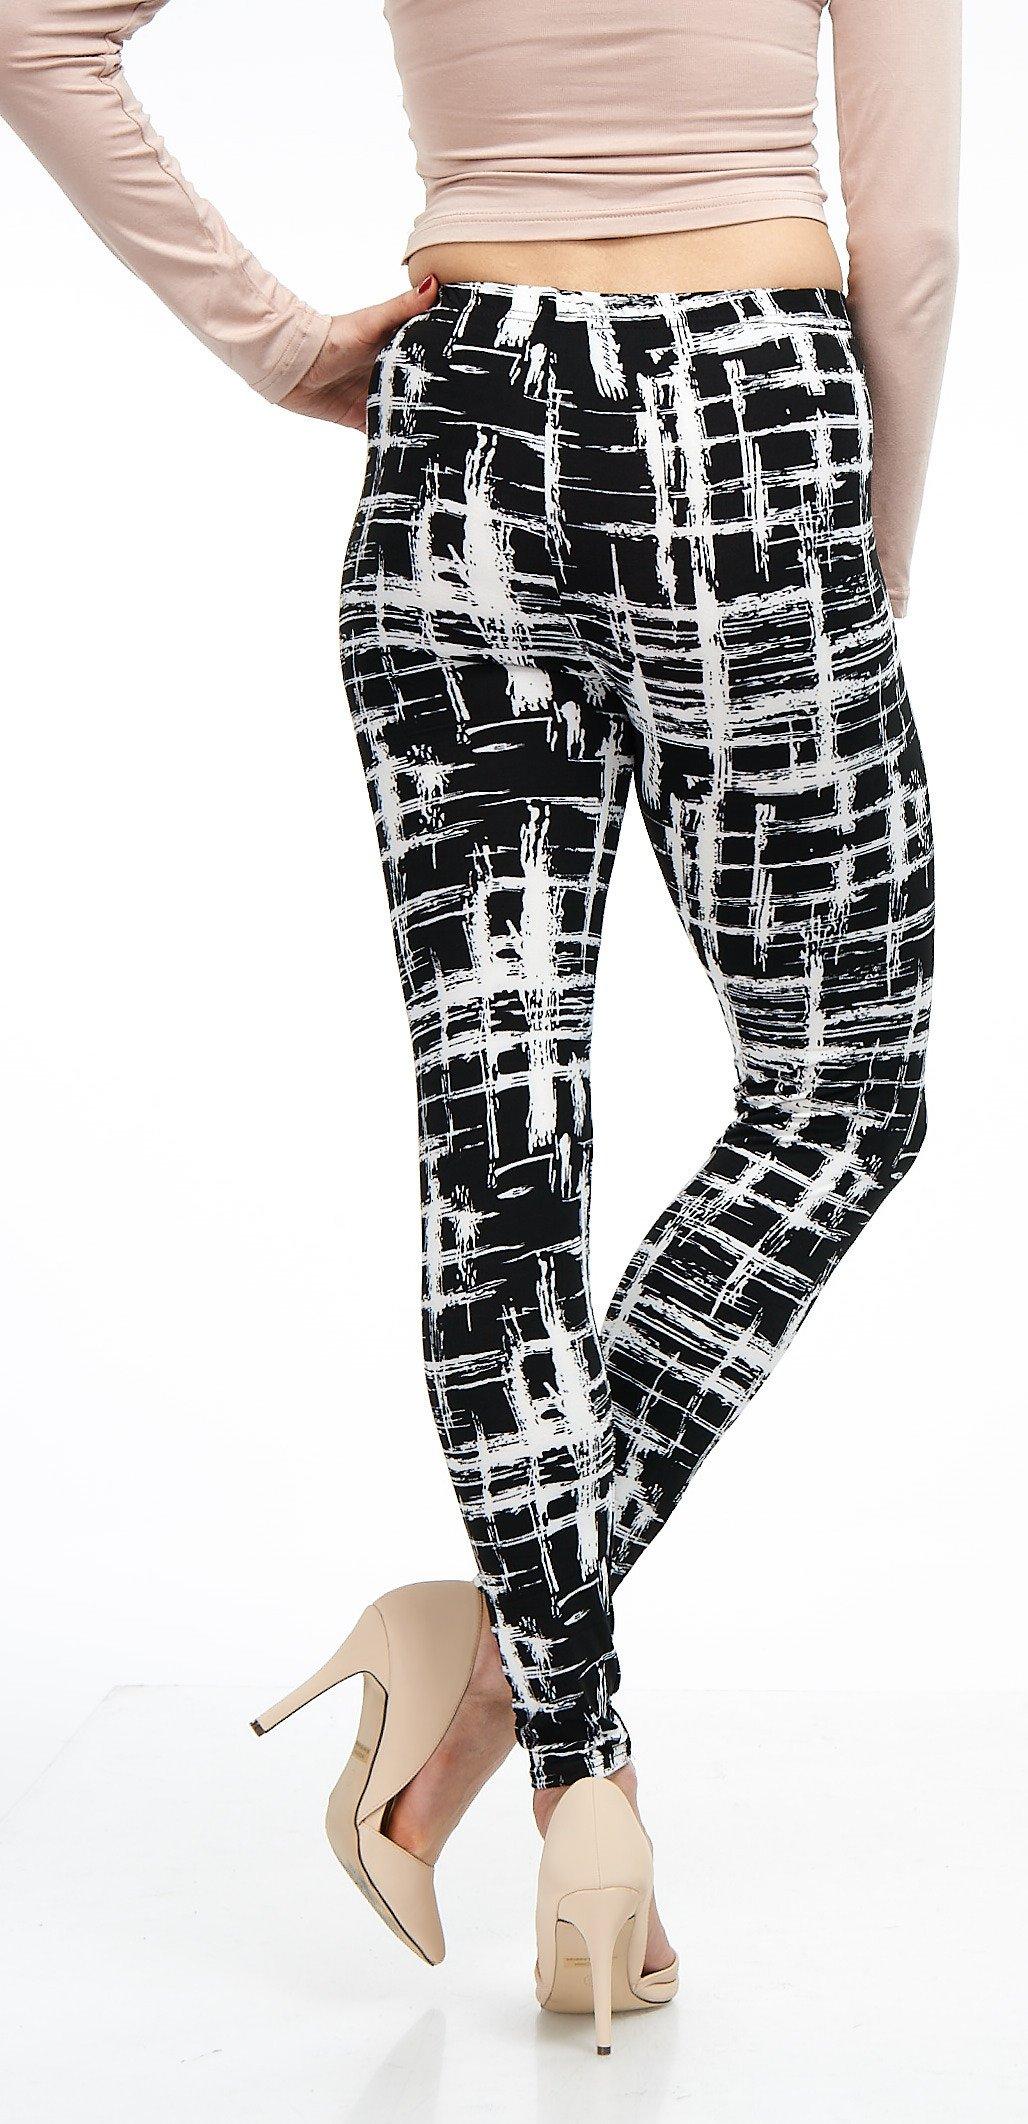 LMB Lush Moda Extra Soft Leggings with Designs- Variety of Prints - 720F Black White Stripes B5 by LMB (Image #9)